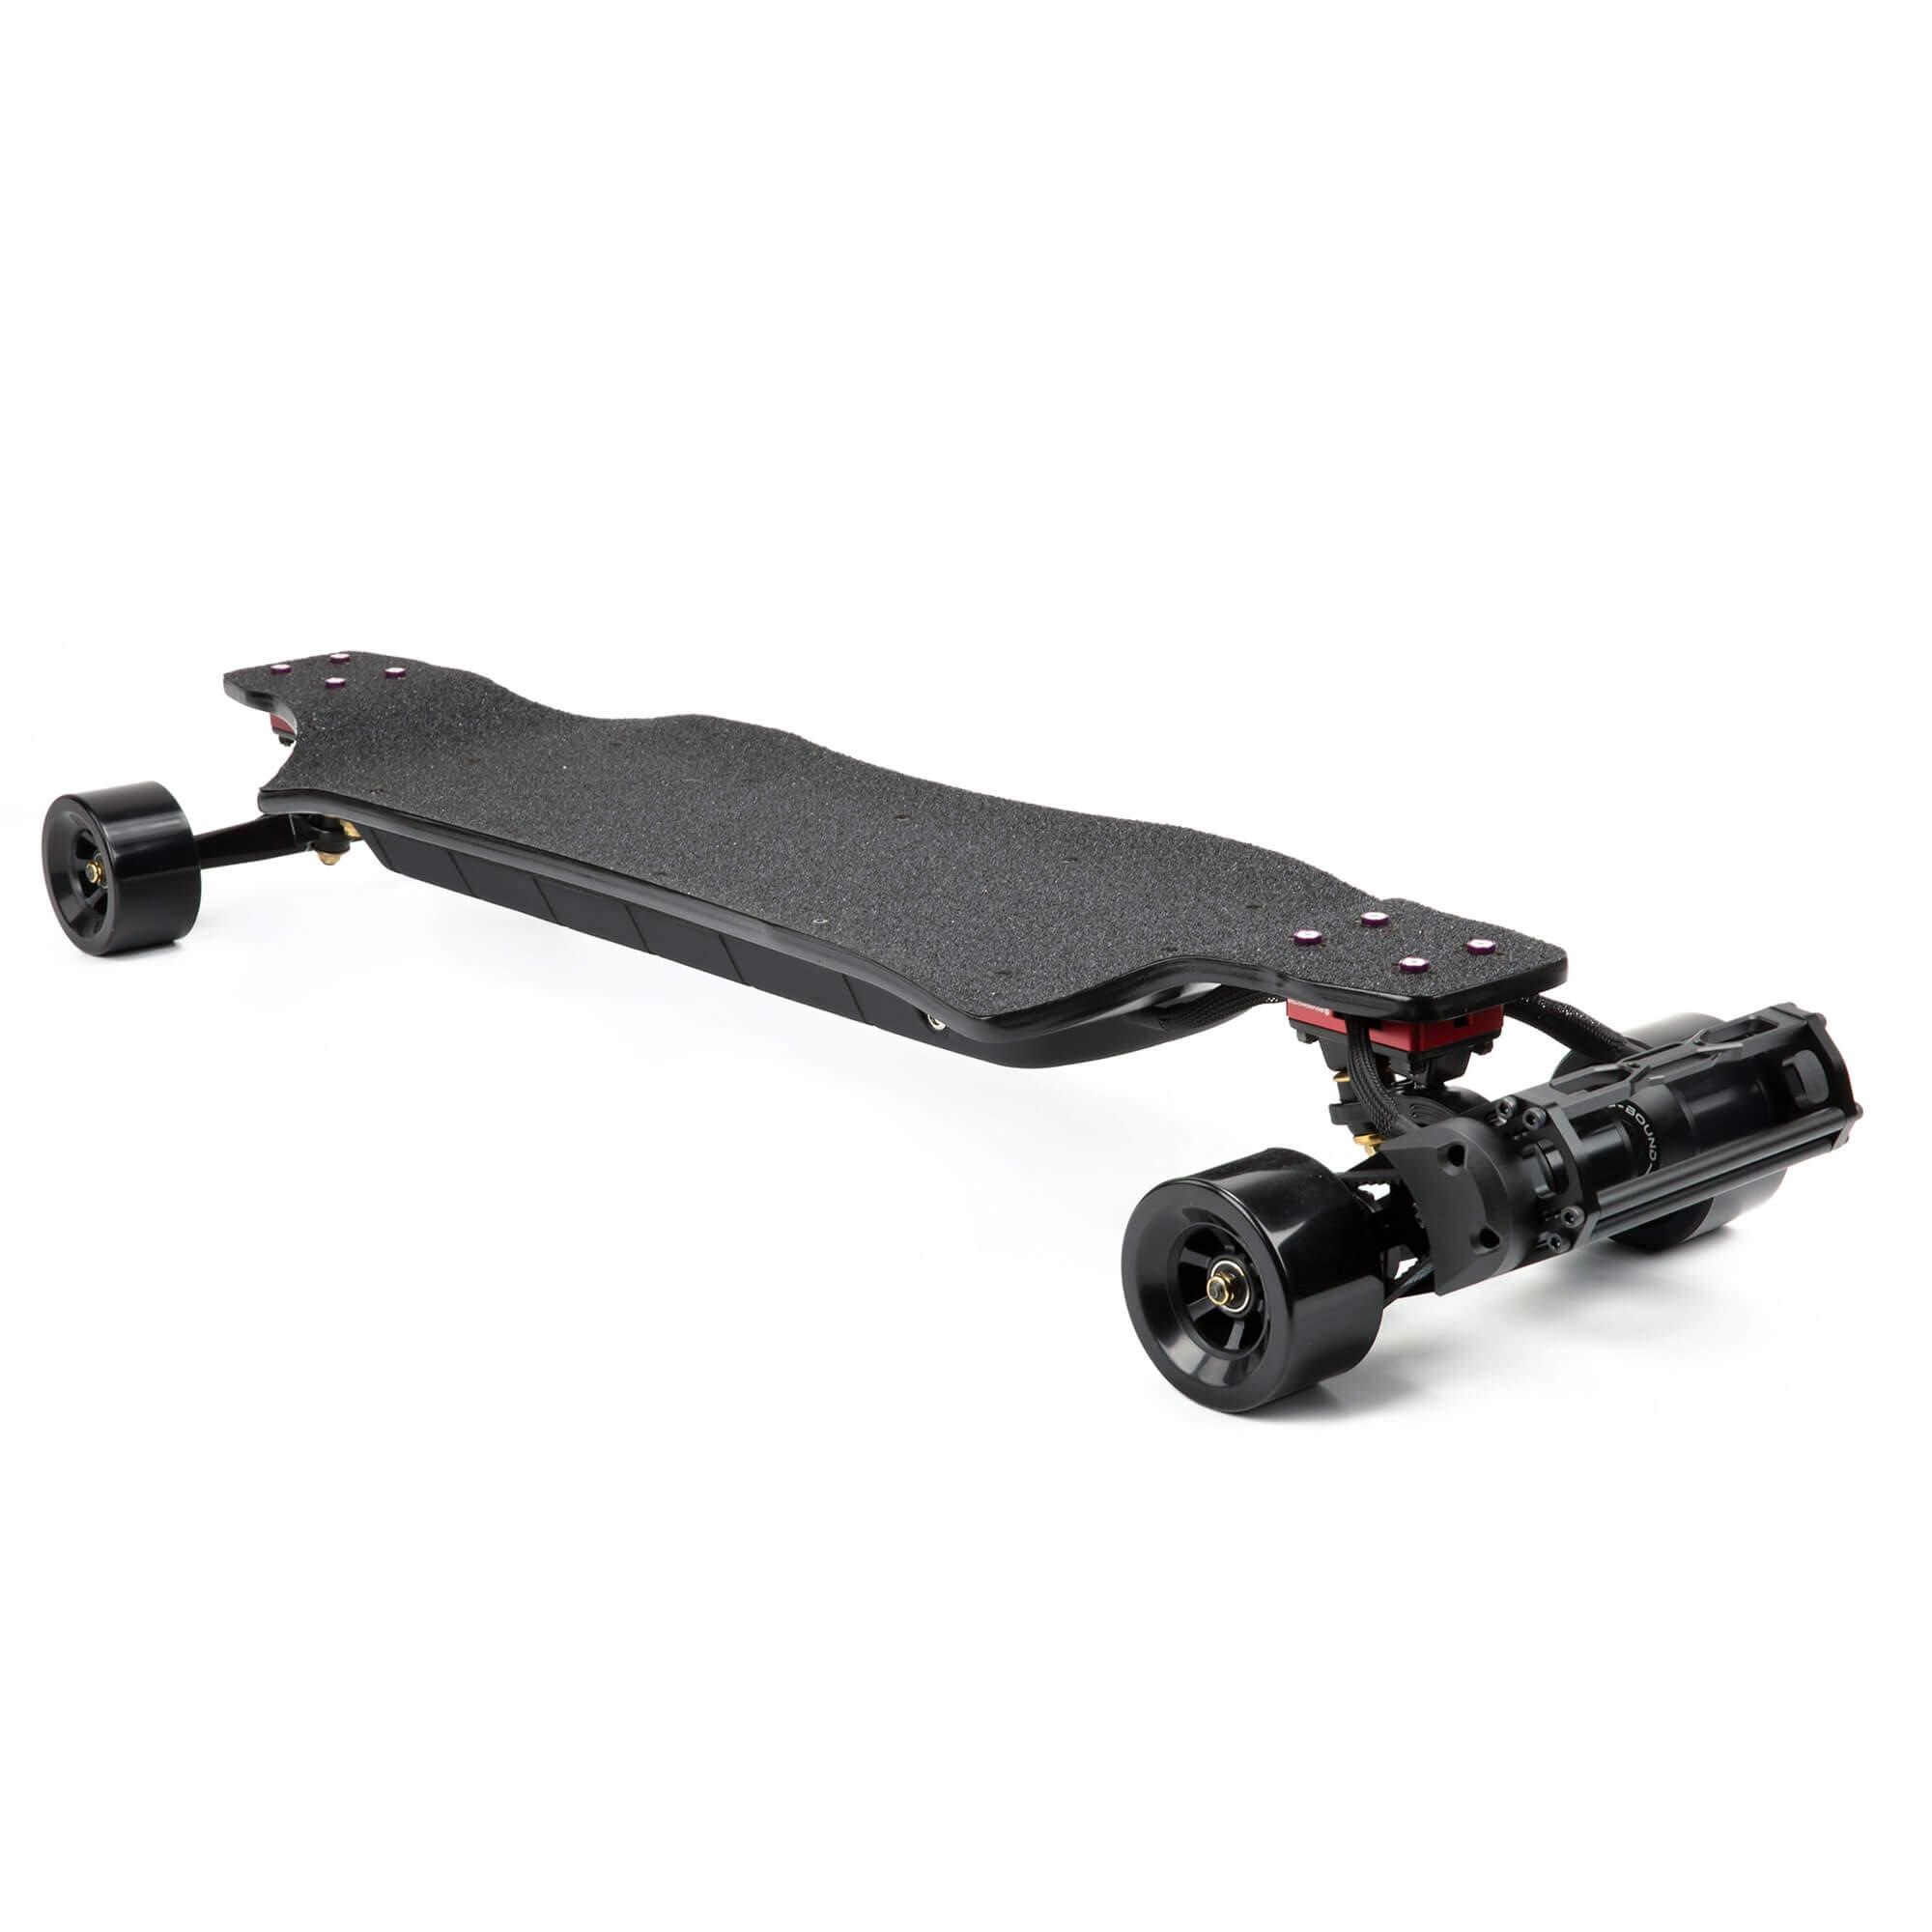 BOUNDMOTOR-Speeder---Belt-Drive-Electric-Skateboard